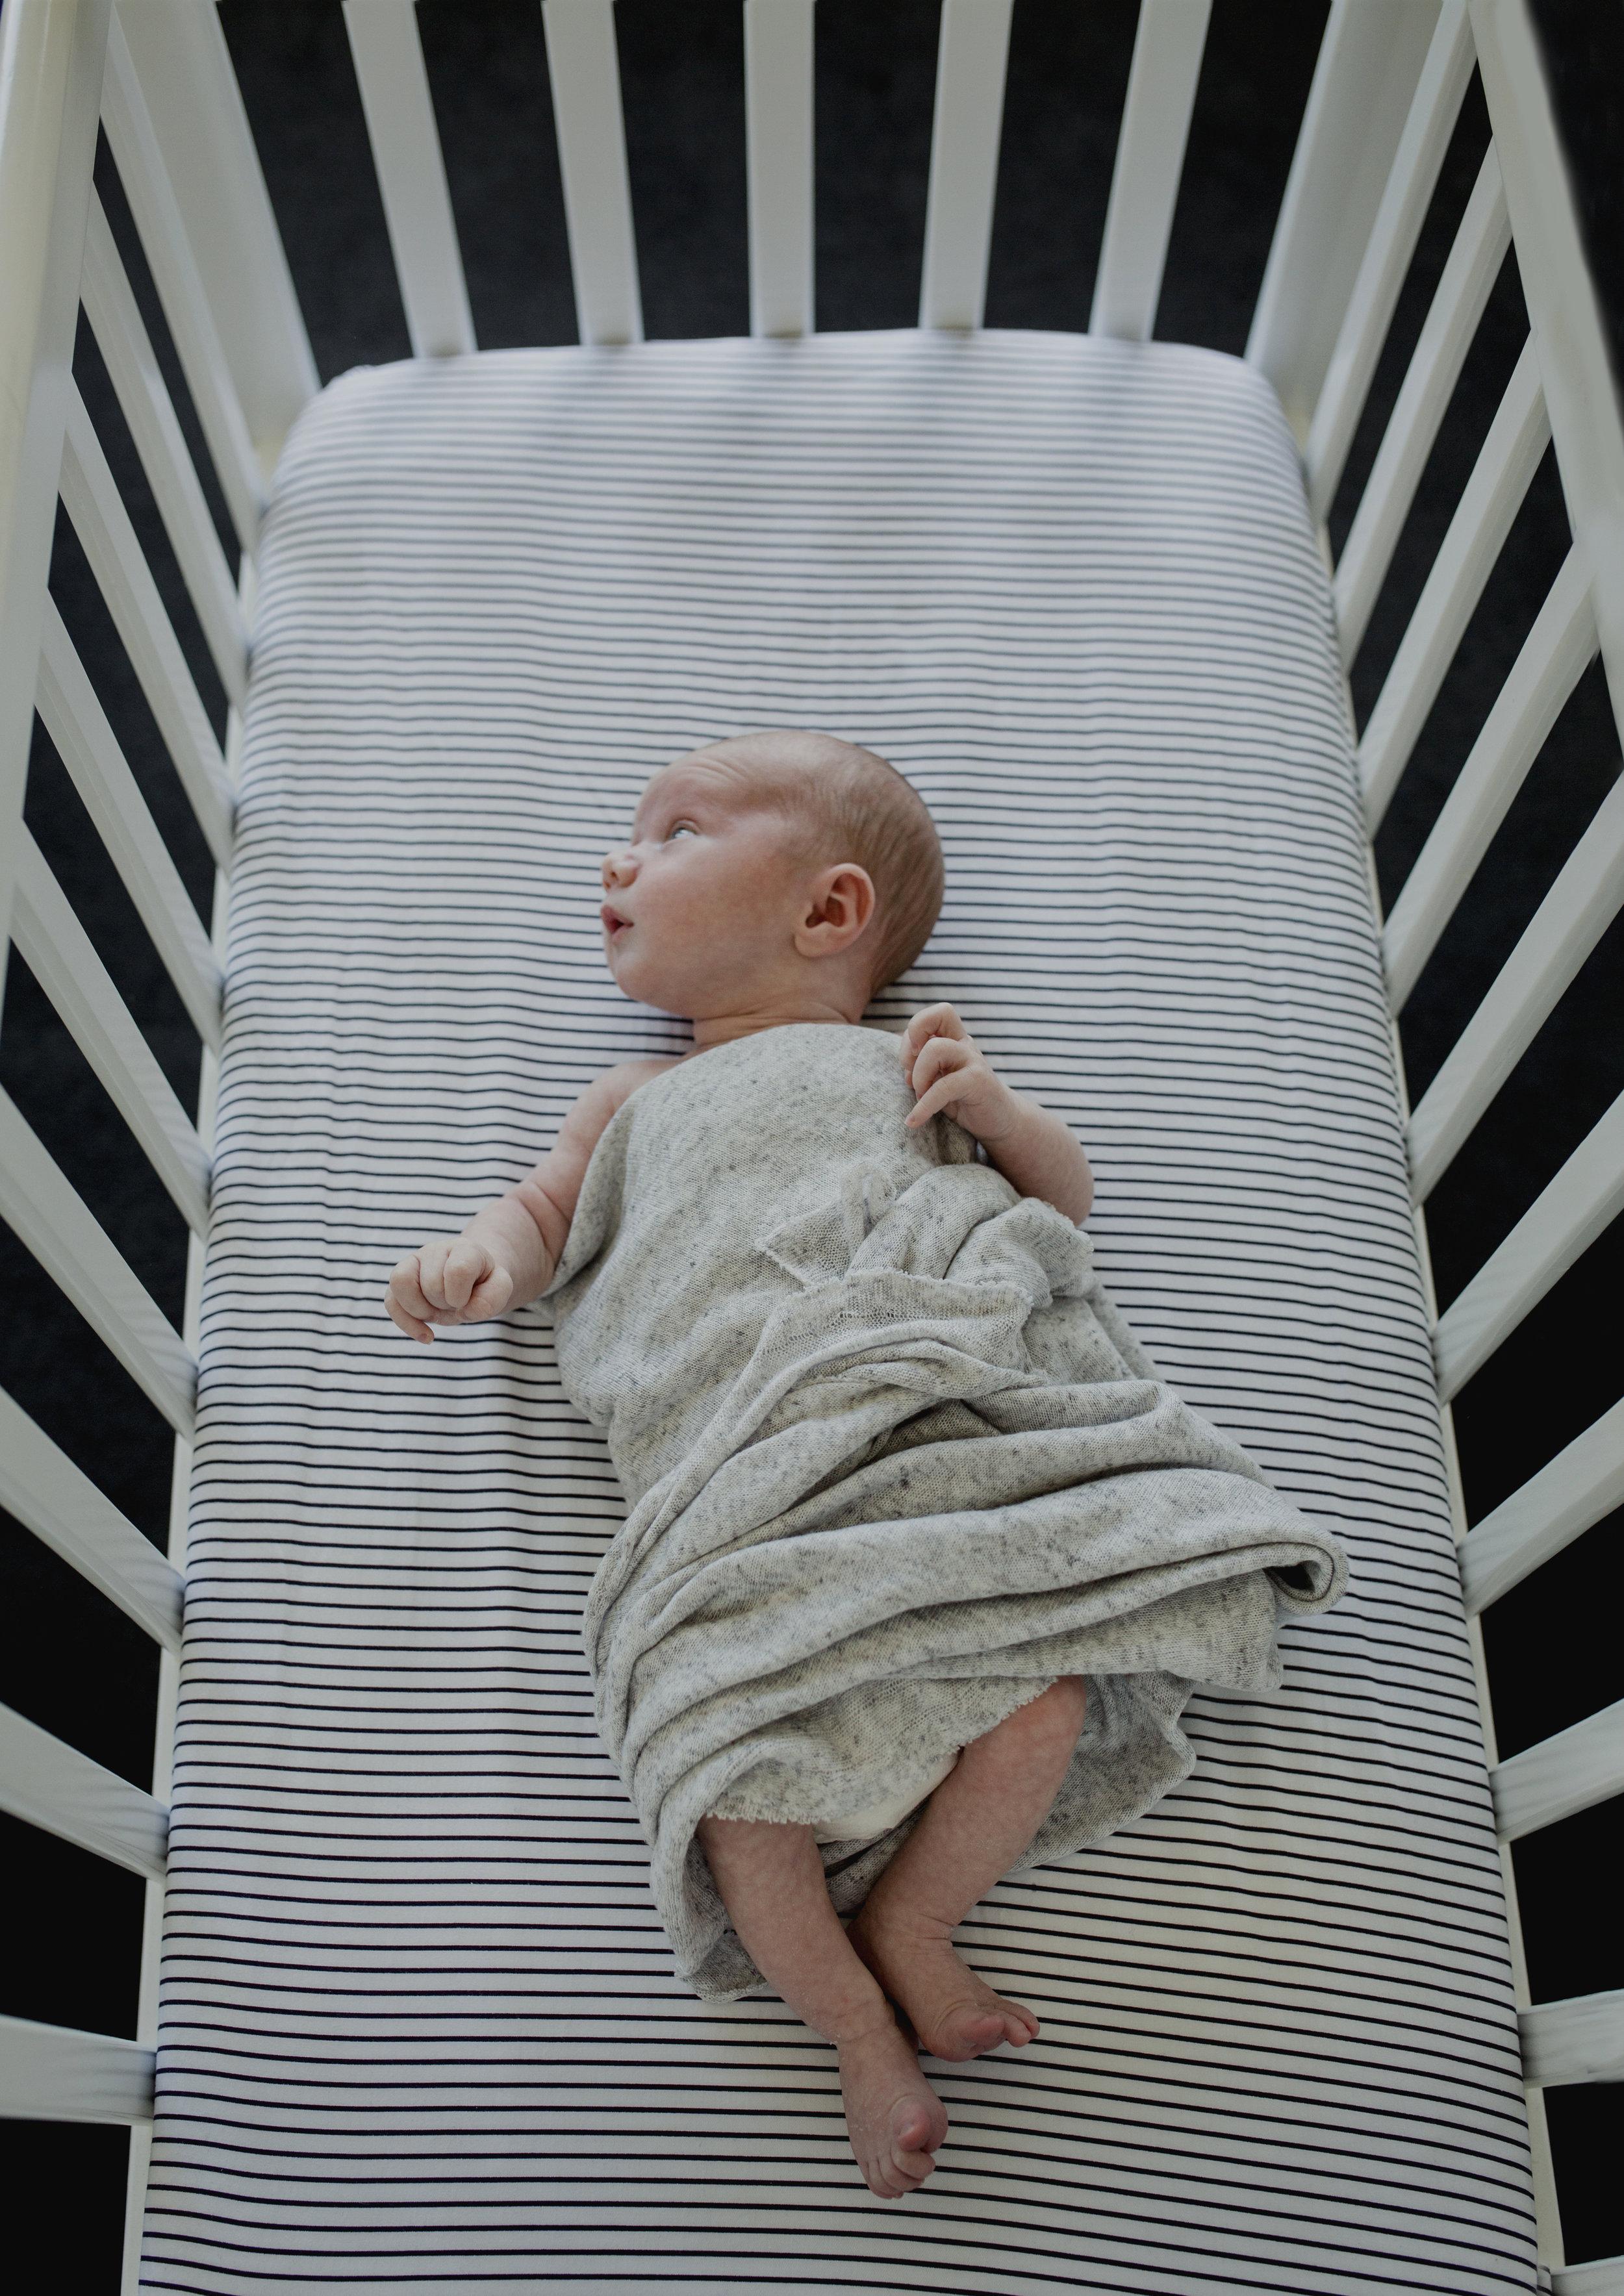 Newborn baby boy in his cot